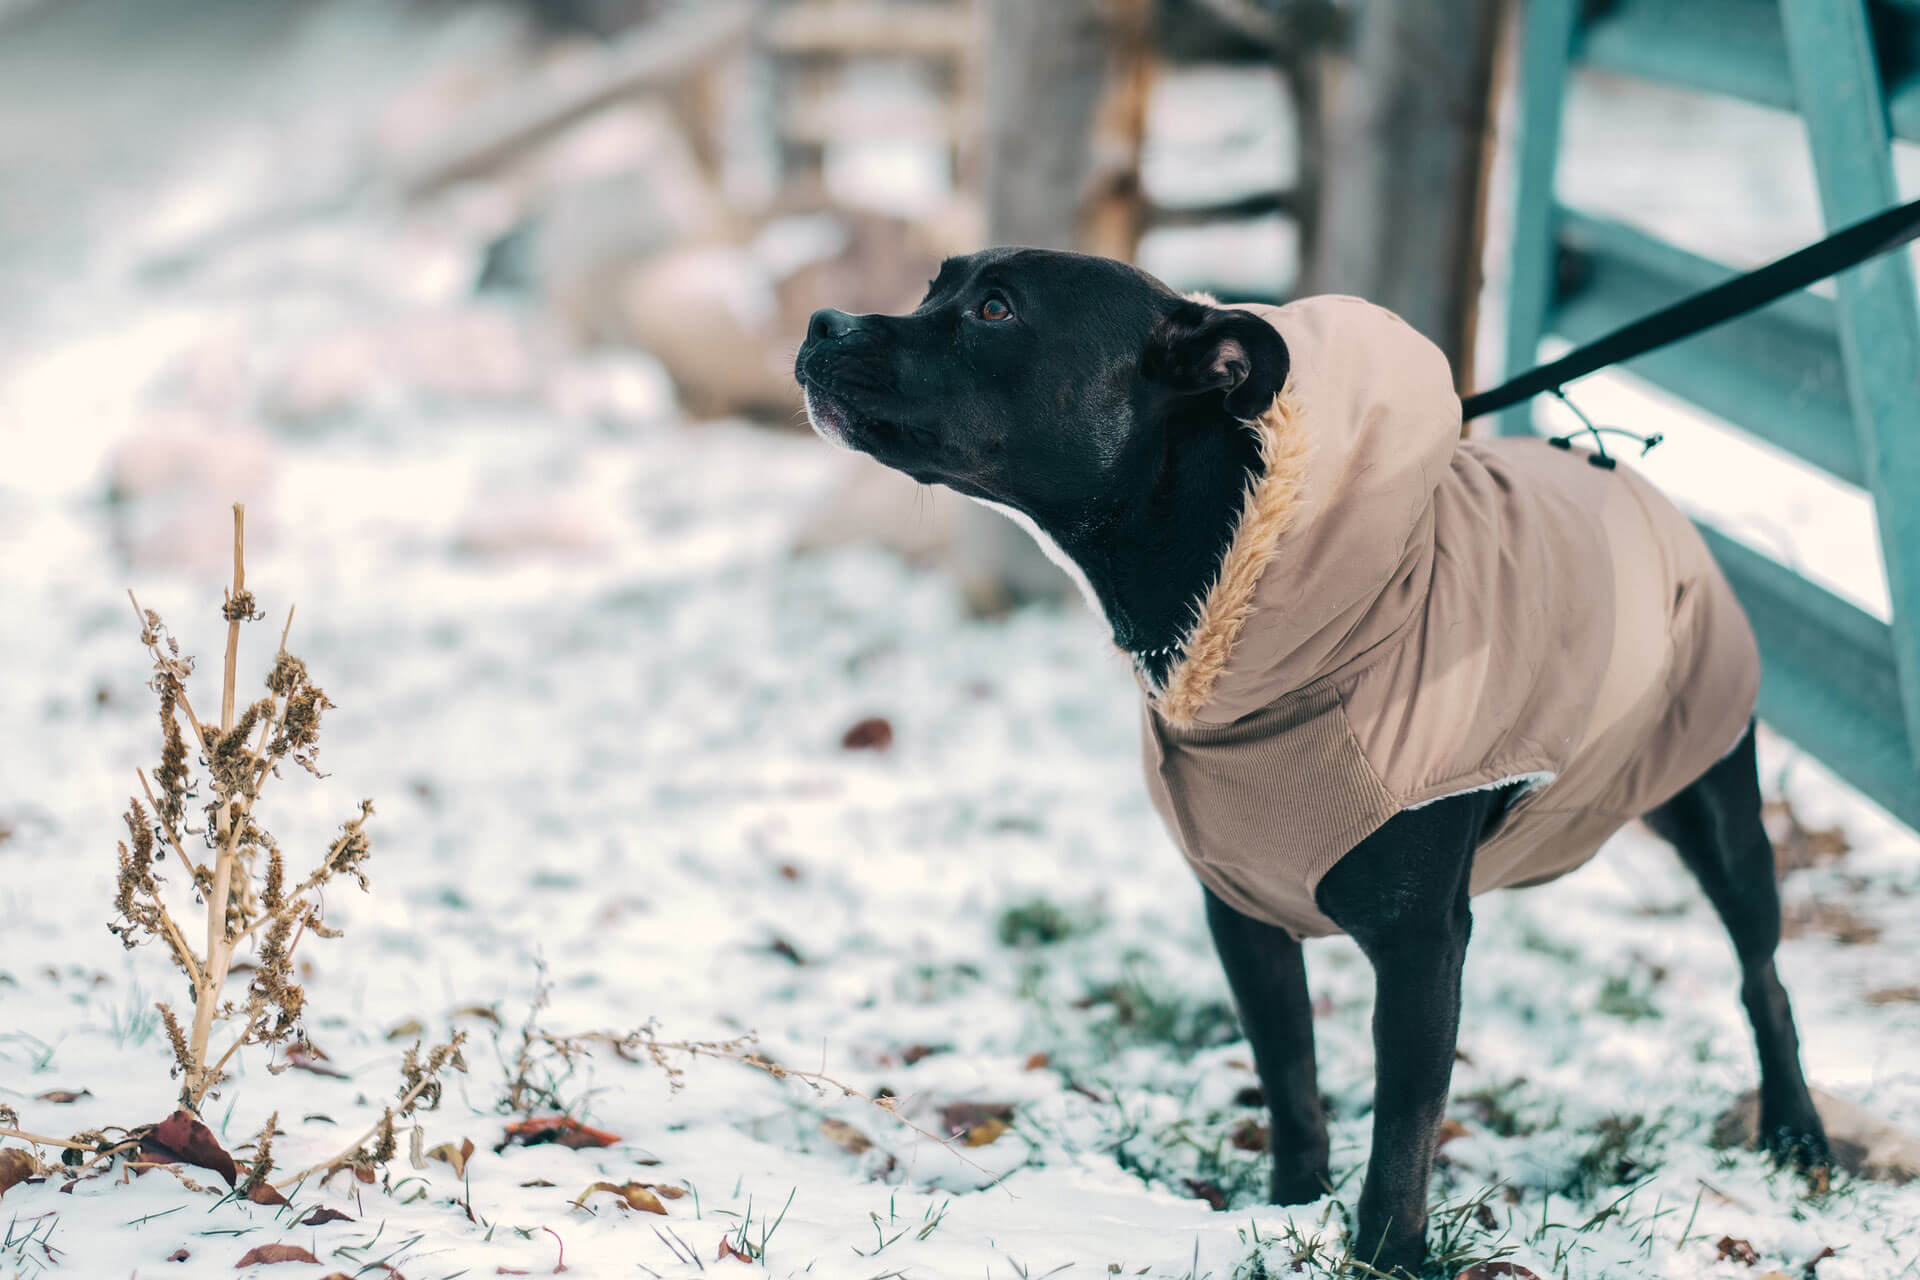 Hundewintermantel - in wenigen Schritten zur perfekten Hundejacke